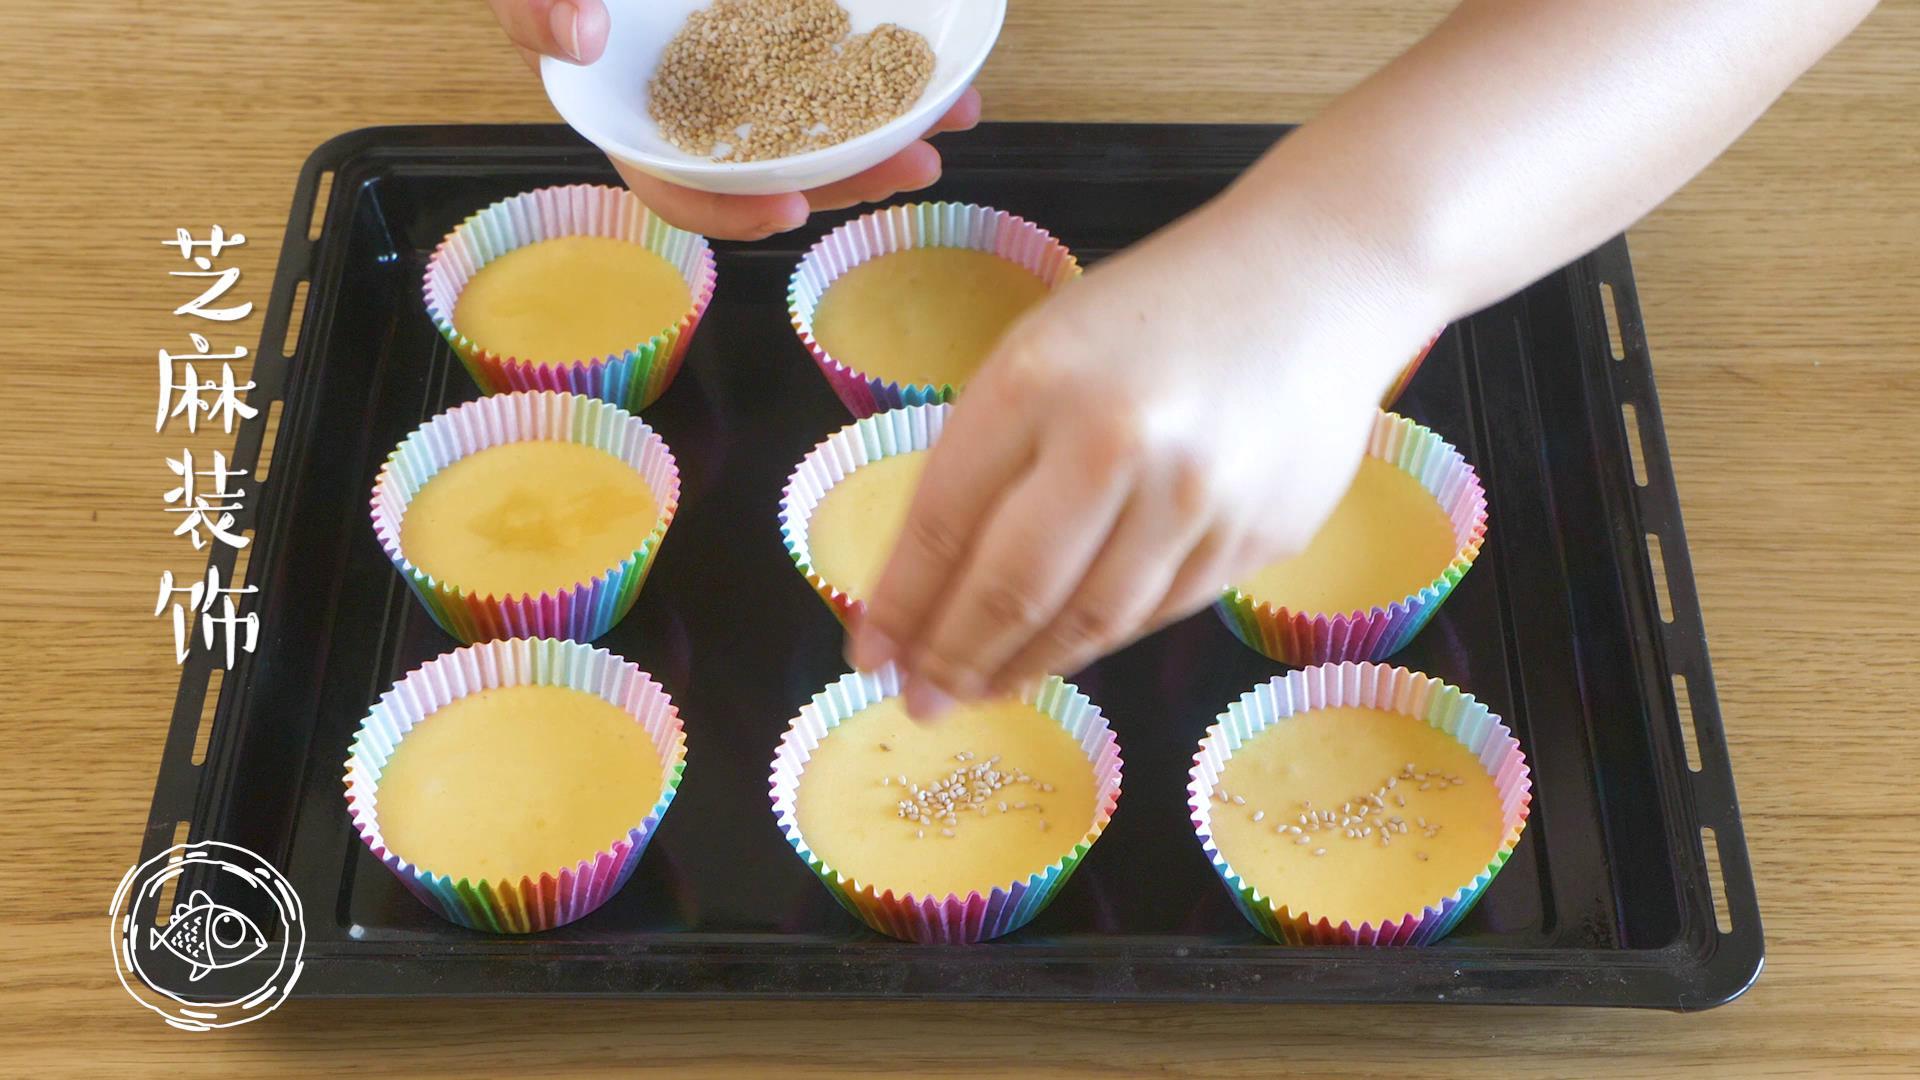 12m+无水蜂蜜蛋糕(宝宝辅食),撒上芝麻装饰,烤箱180度预热5分钟~</p> <p>